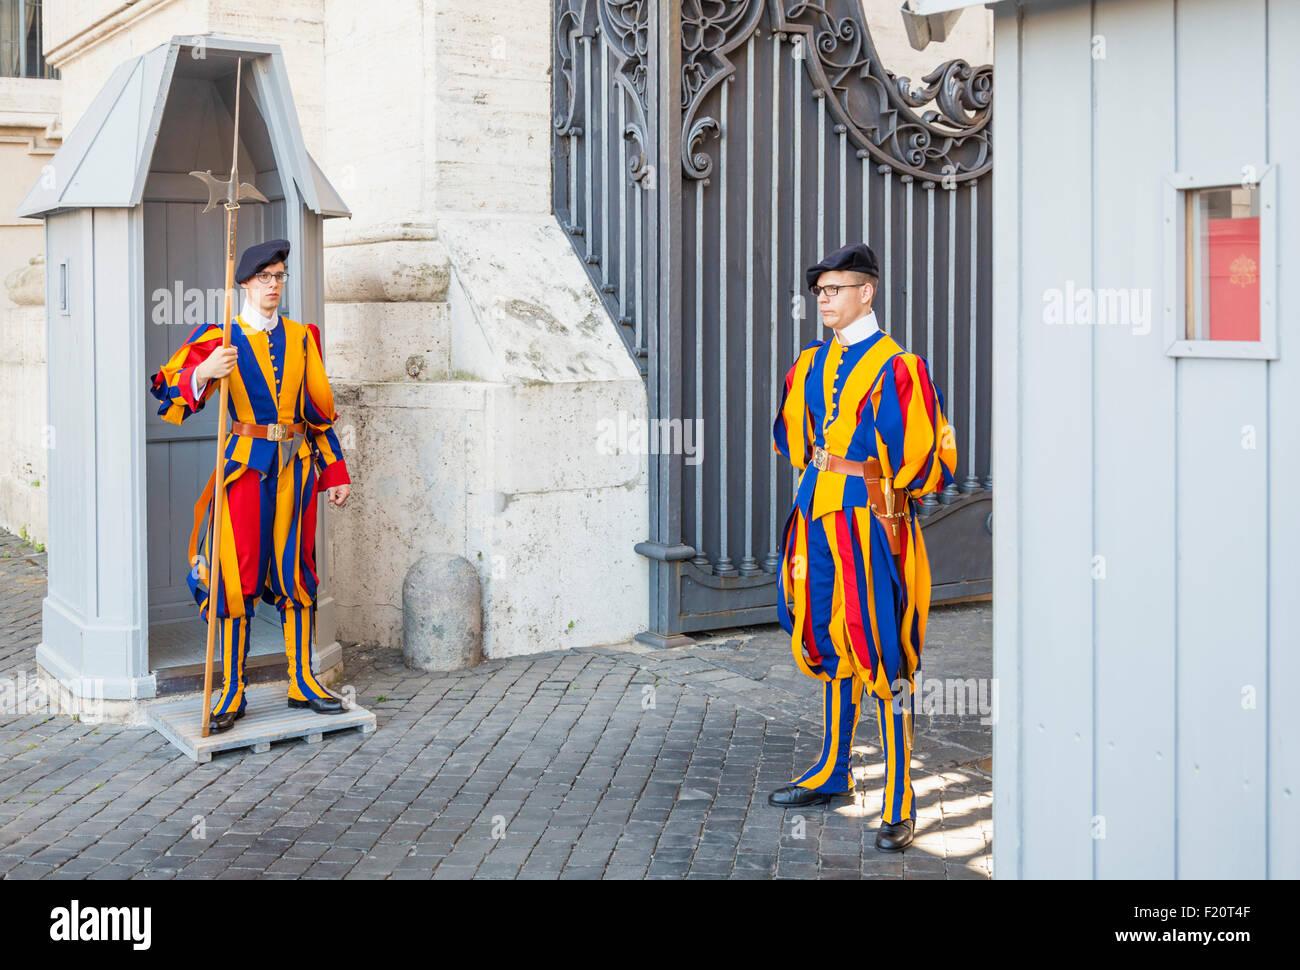 Members of the Pontifical Swiss Guard in Vatican City guarding St Peters Basilica Rome Roma Lazio Italy EU Europe - Stock Image